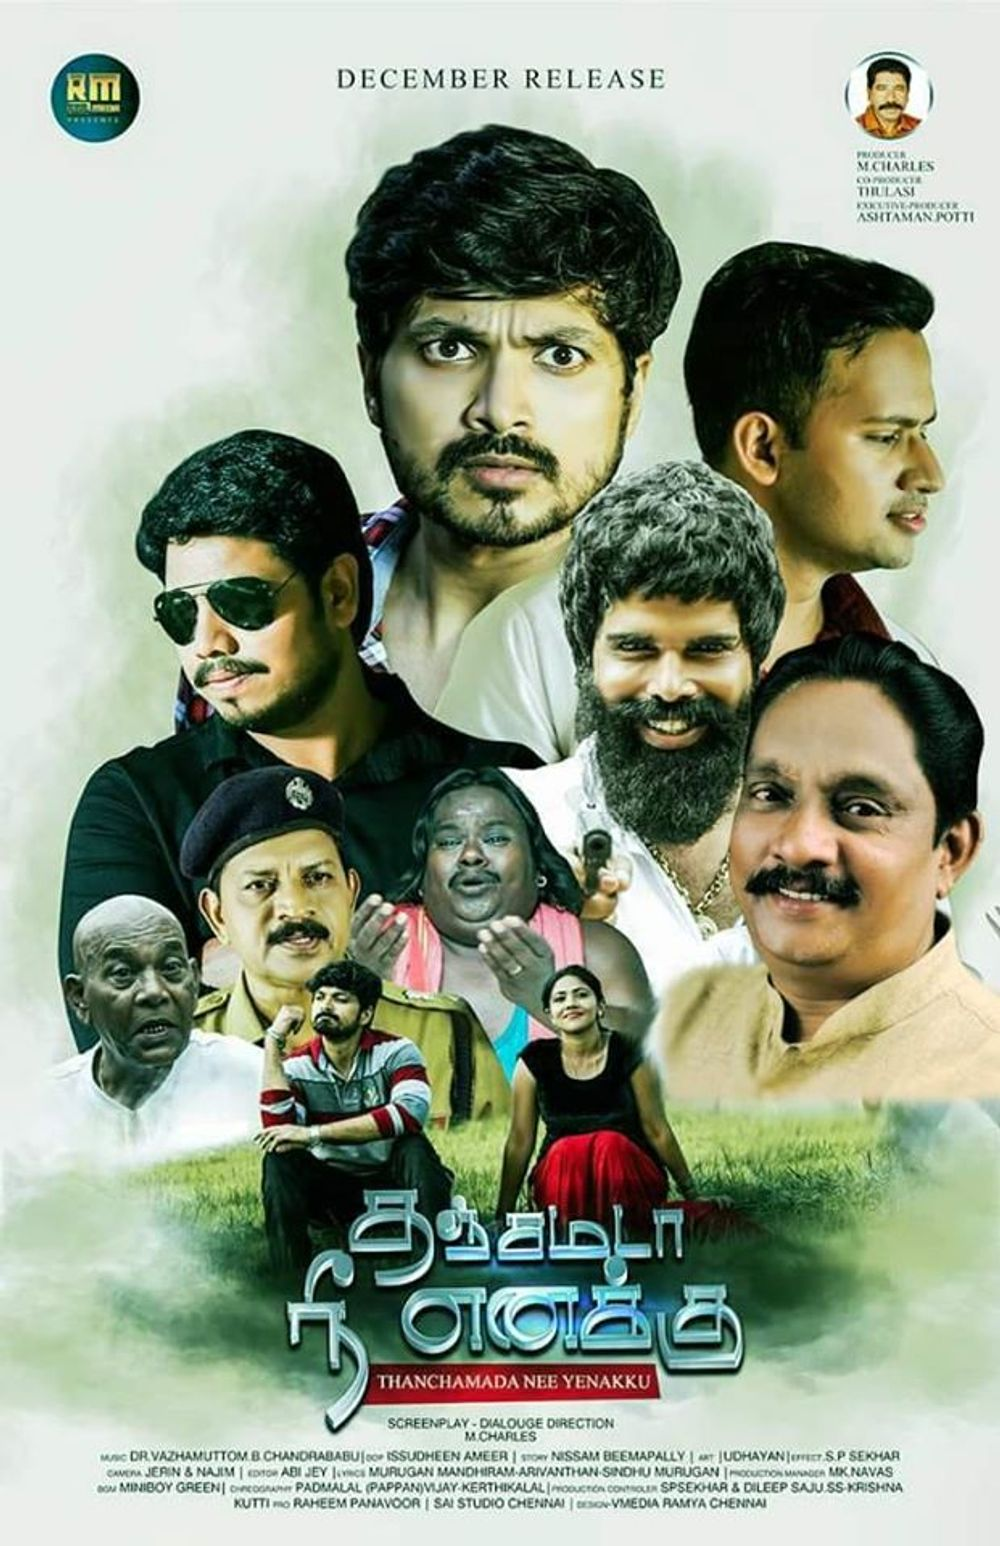 Thanjamada Nee Enakku 2021 Tamil 720p HDRip 1.2GB | 415MB Download